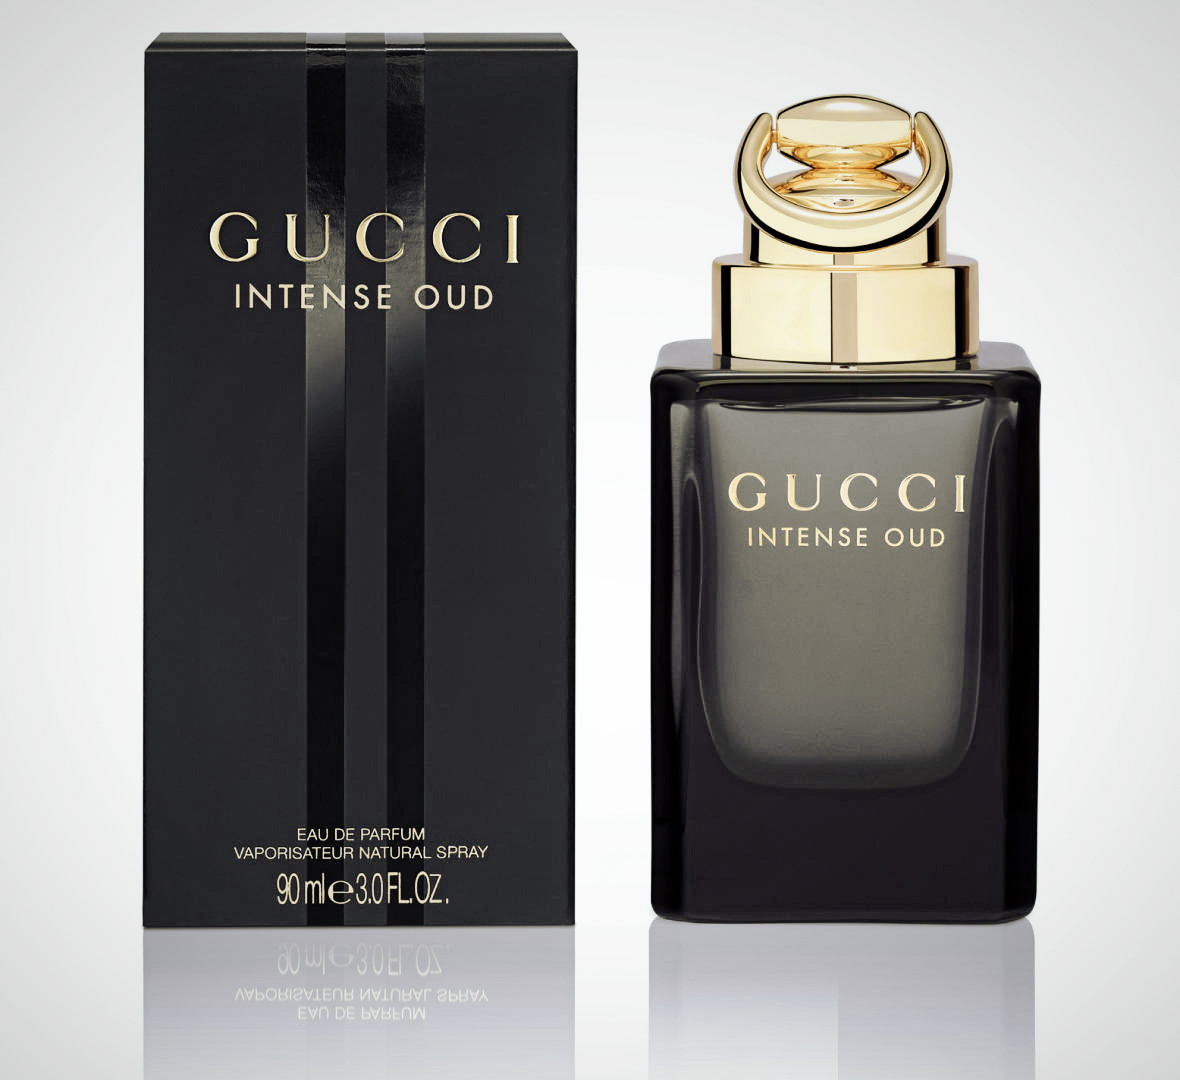 d780f7944 عطر قوتشي عود إنتنس للرجال Gucci Intense Oud